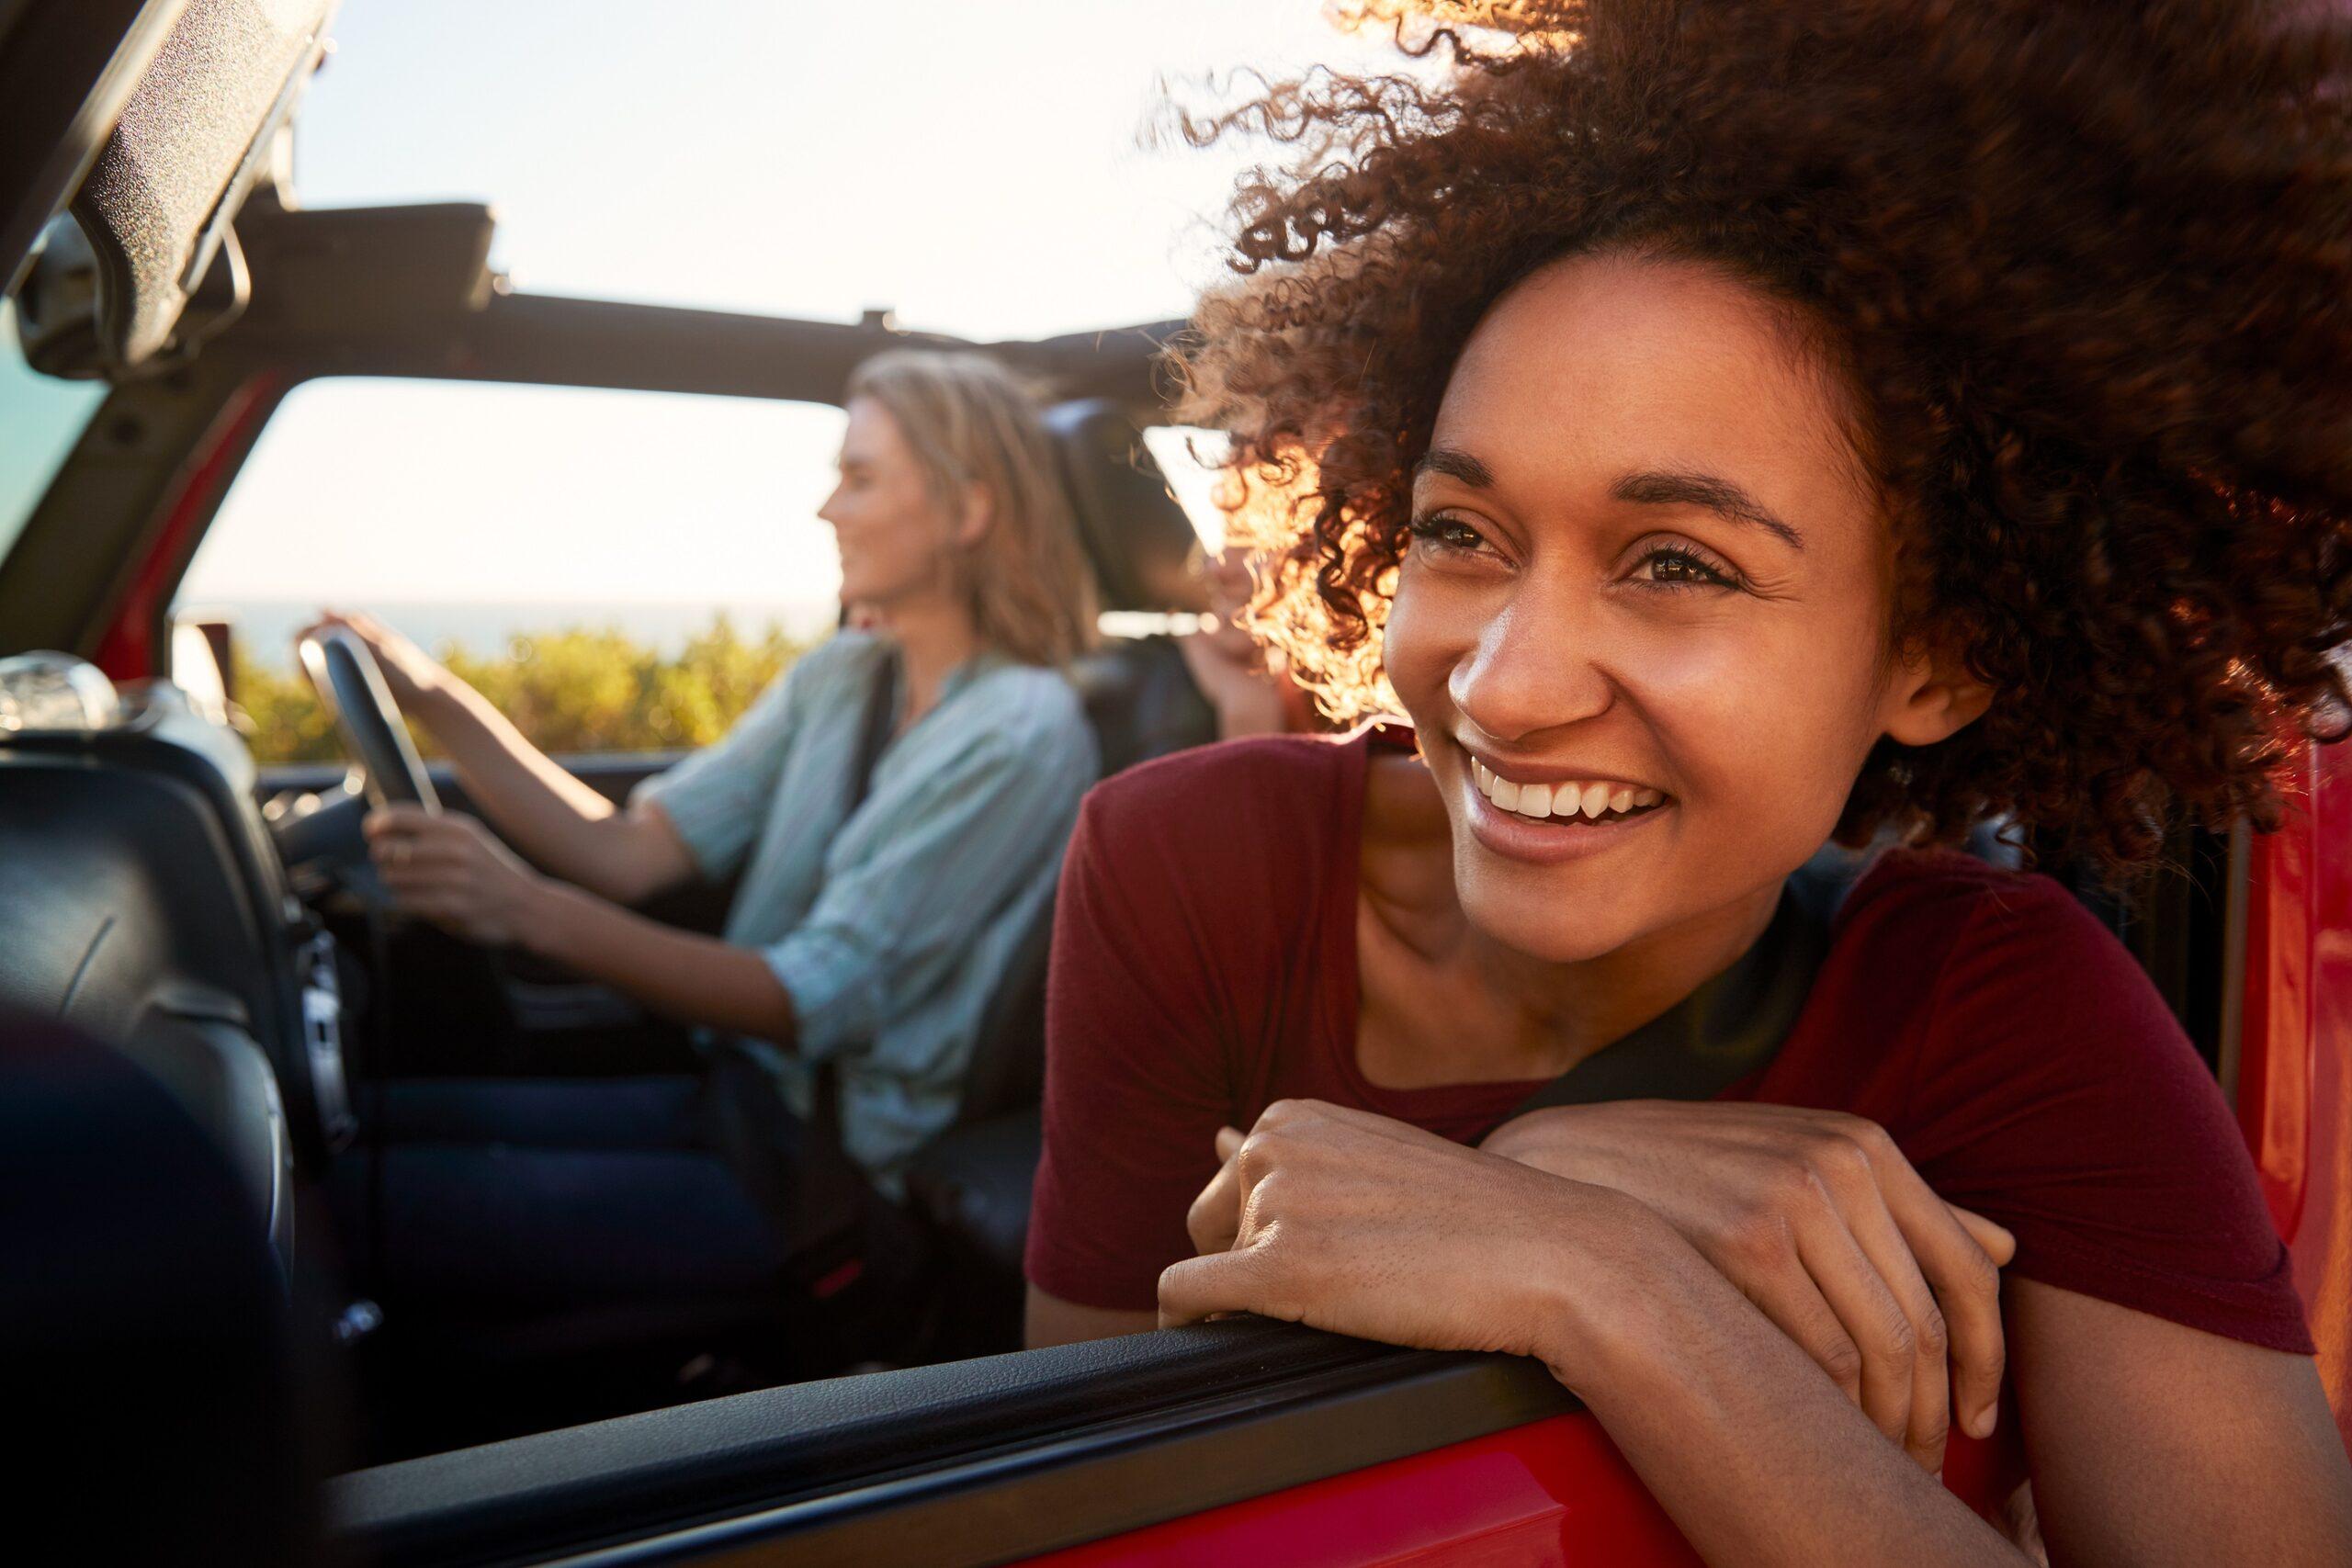 Safe cars for teens